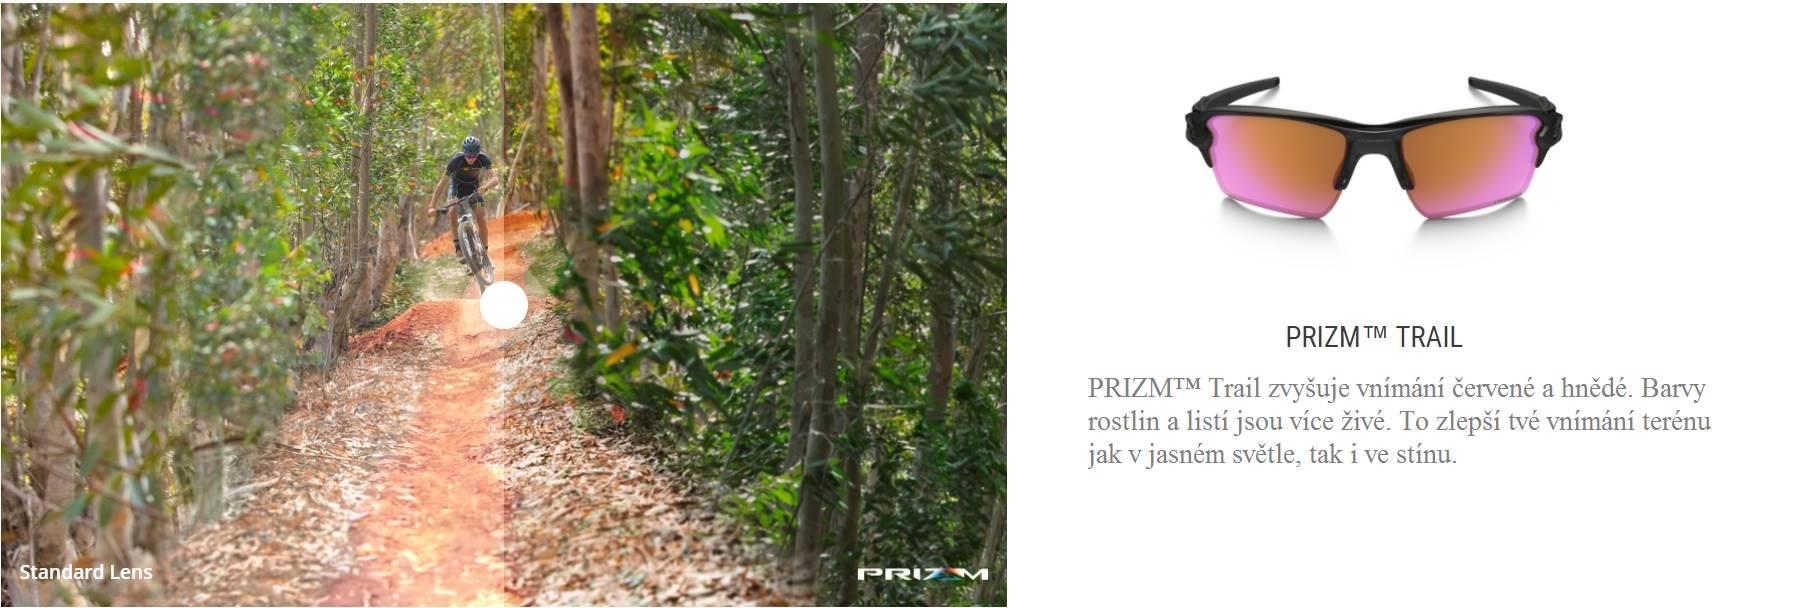 prizm-trail